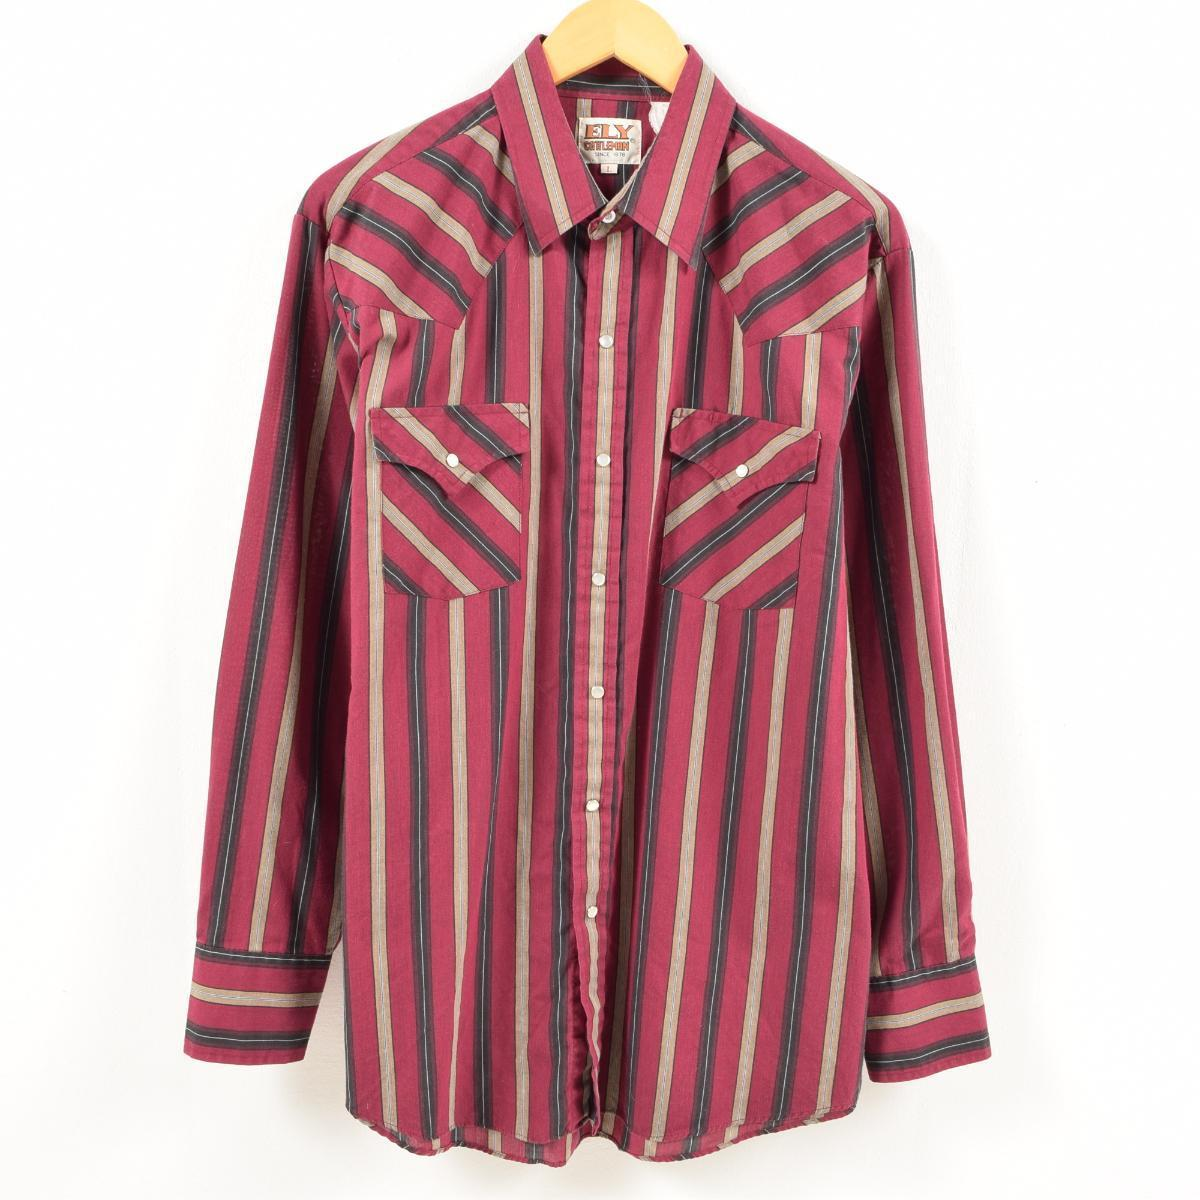 03661c27 70s Elly ELY CATILEMAN stripe bottle tit sleeve western shirt men L vintage  /wam9381 ...